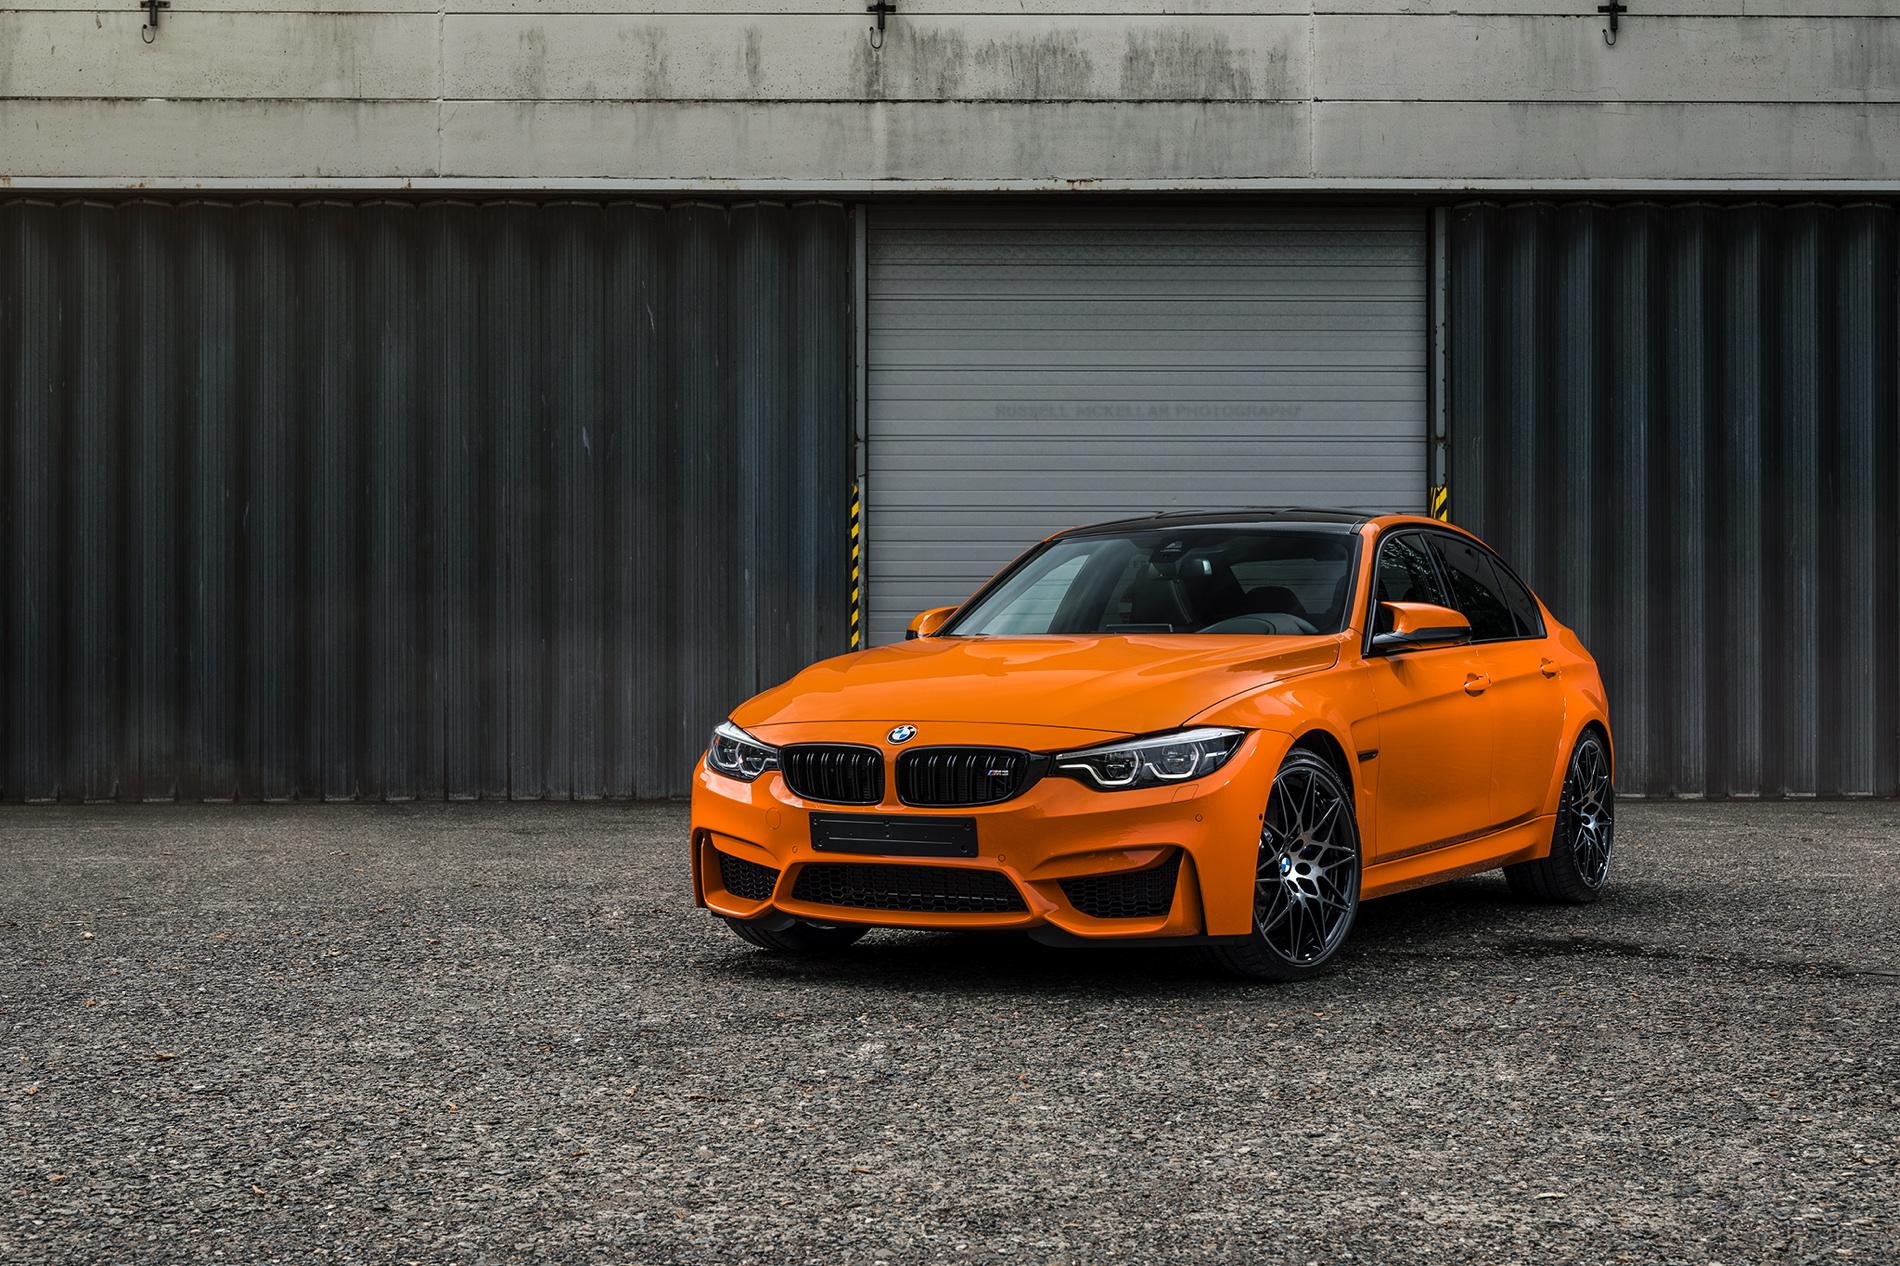 BMW M3 Manufactur Edition 01